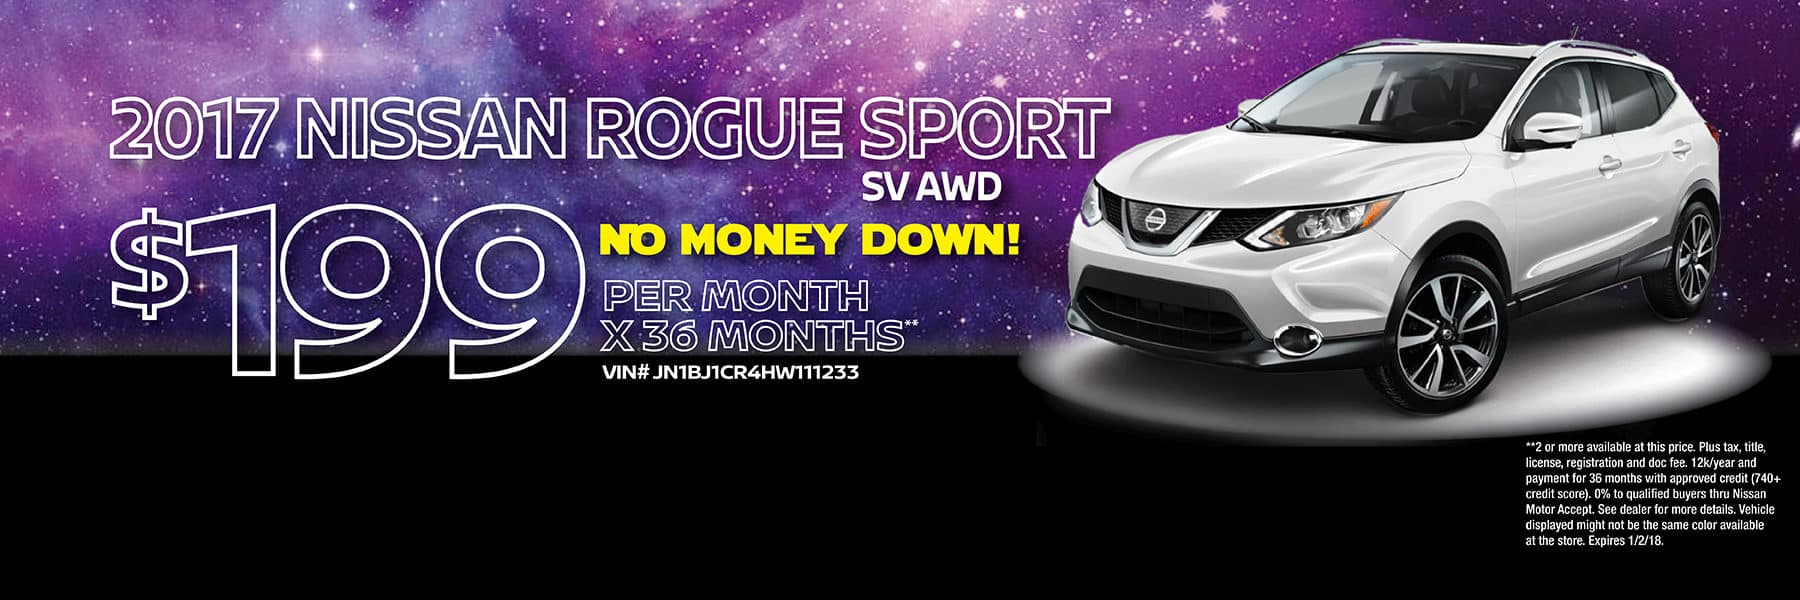 Berman Nissan of Chicago December Holiday Sale 2017 Nissan Rogue Sport Offer